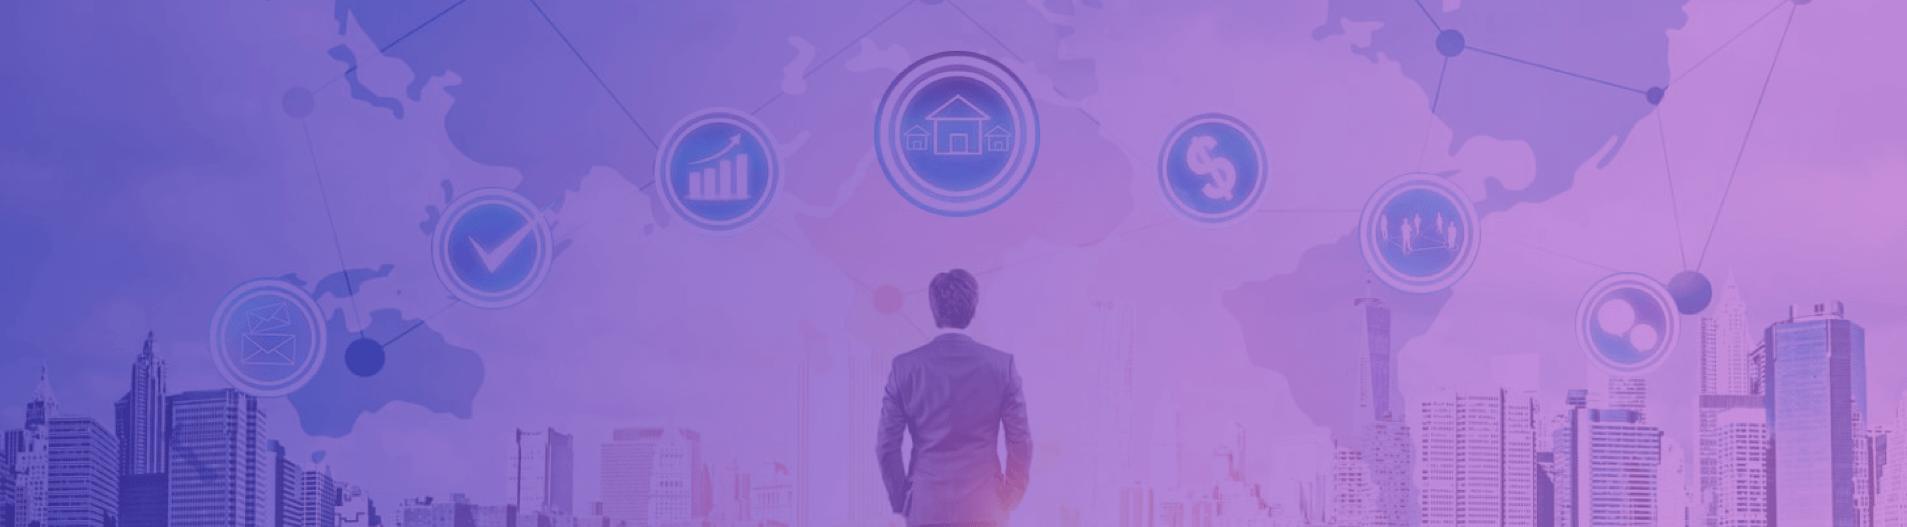 Escritório virtual: facilidade para o empreendedor